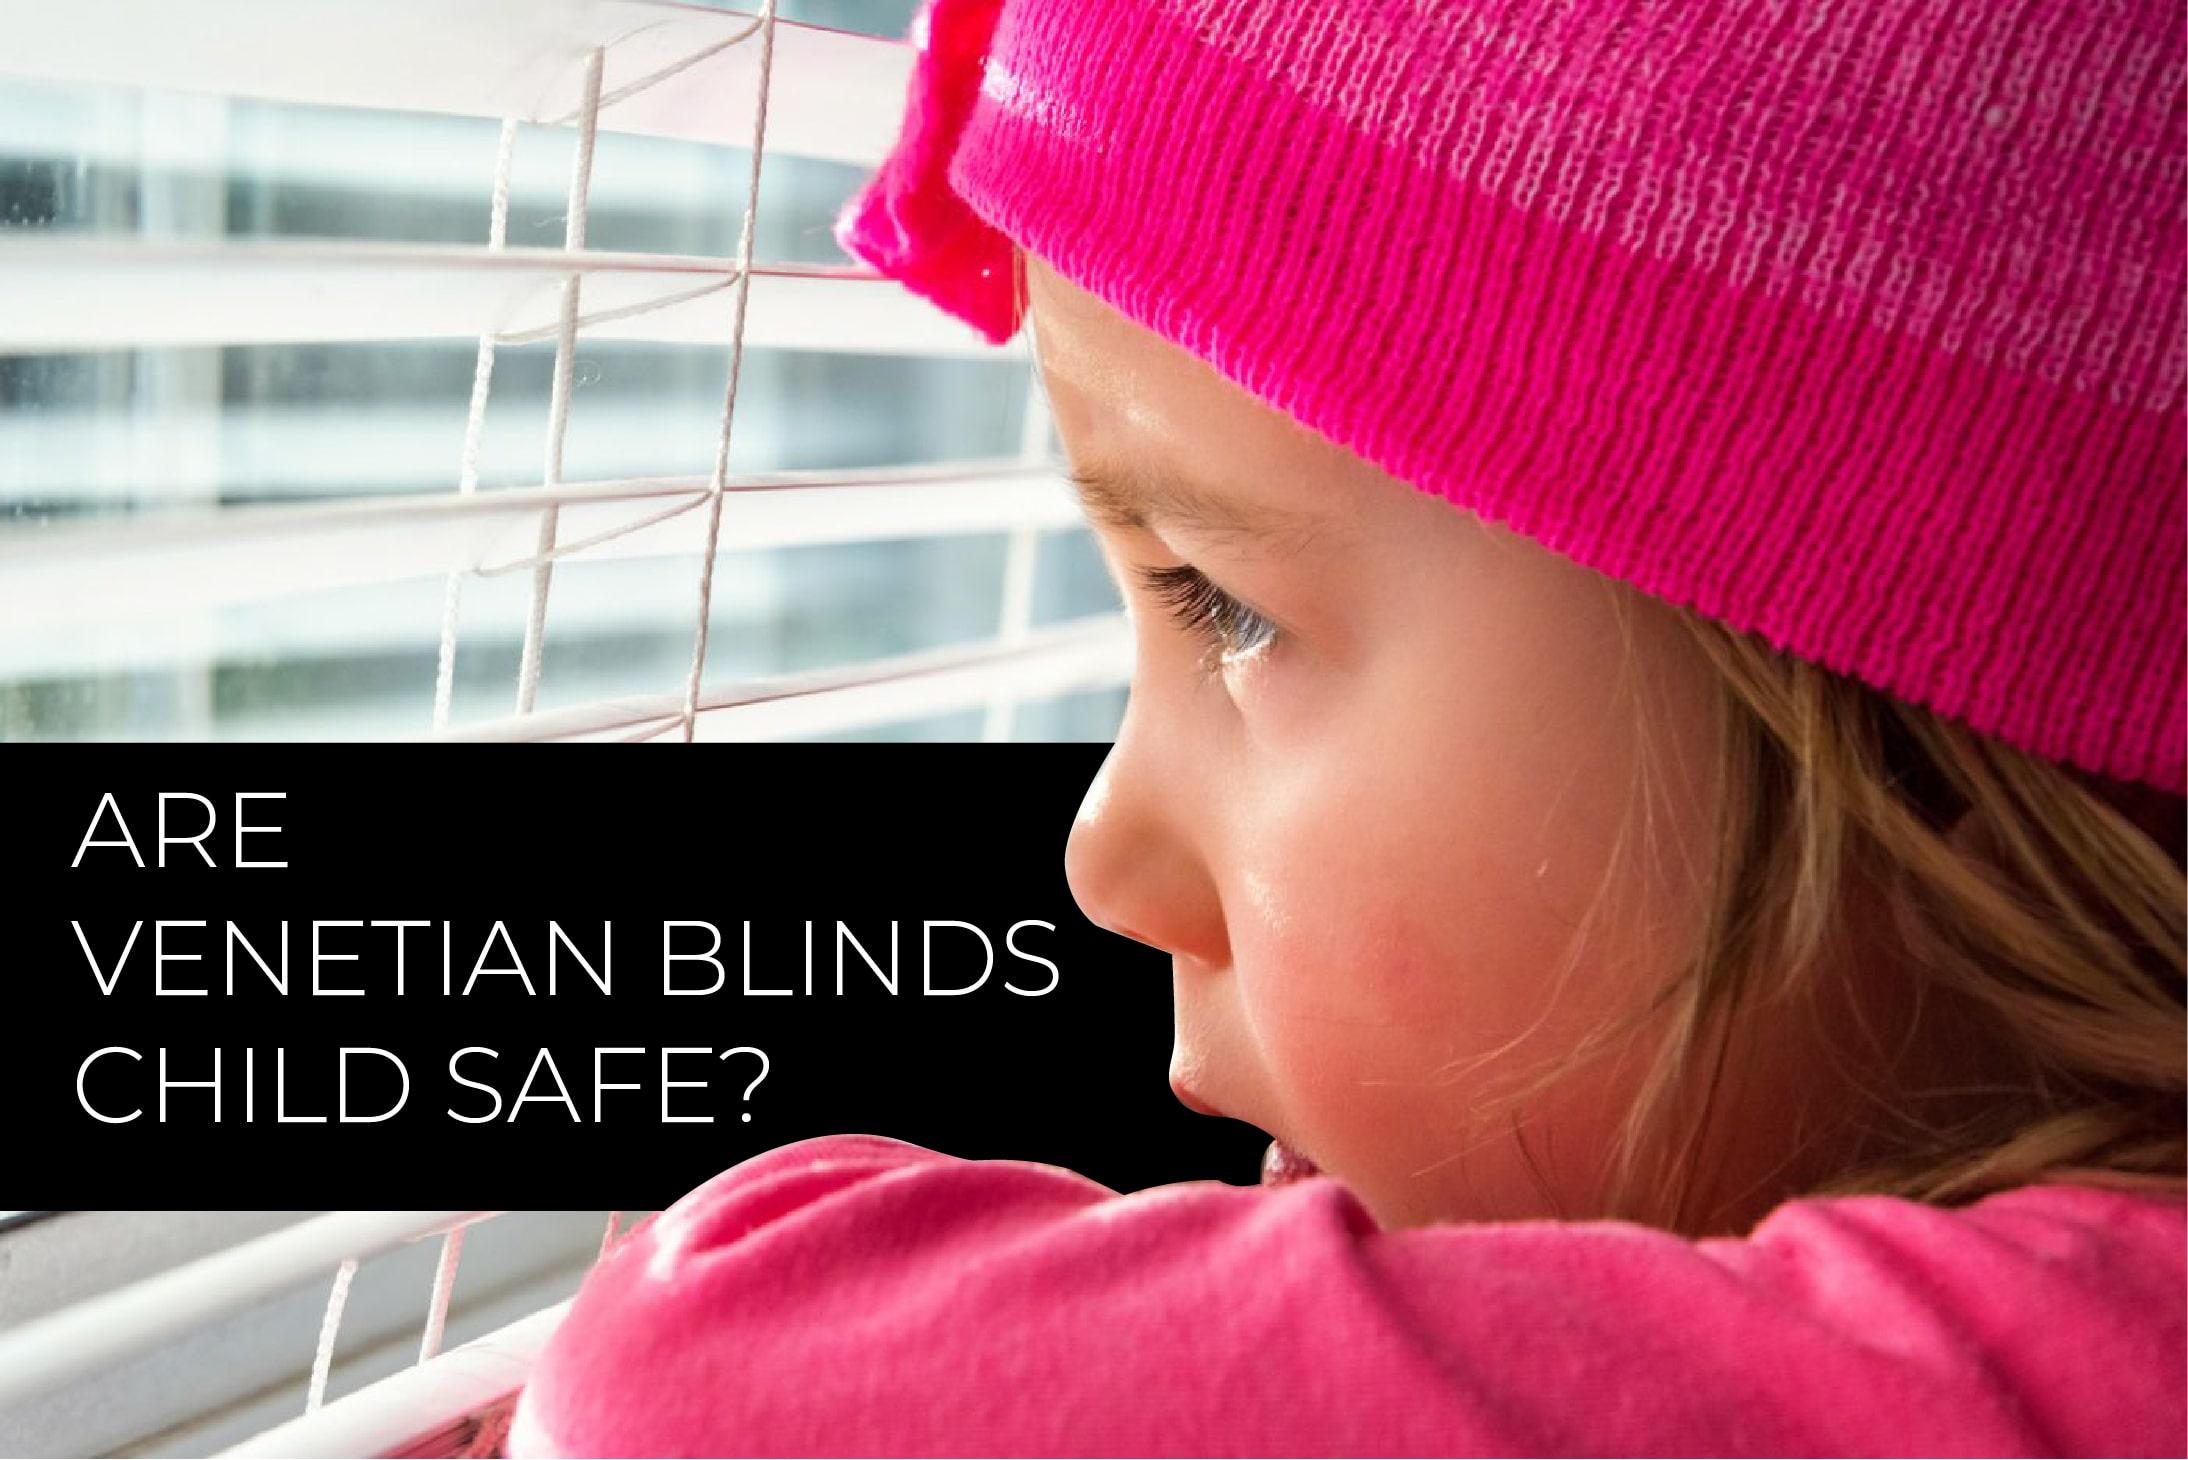 are-venetian-blinds-child-safe